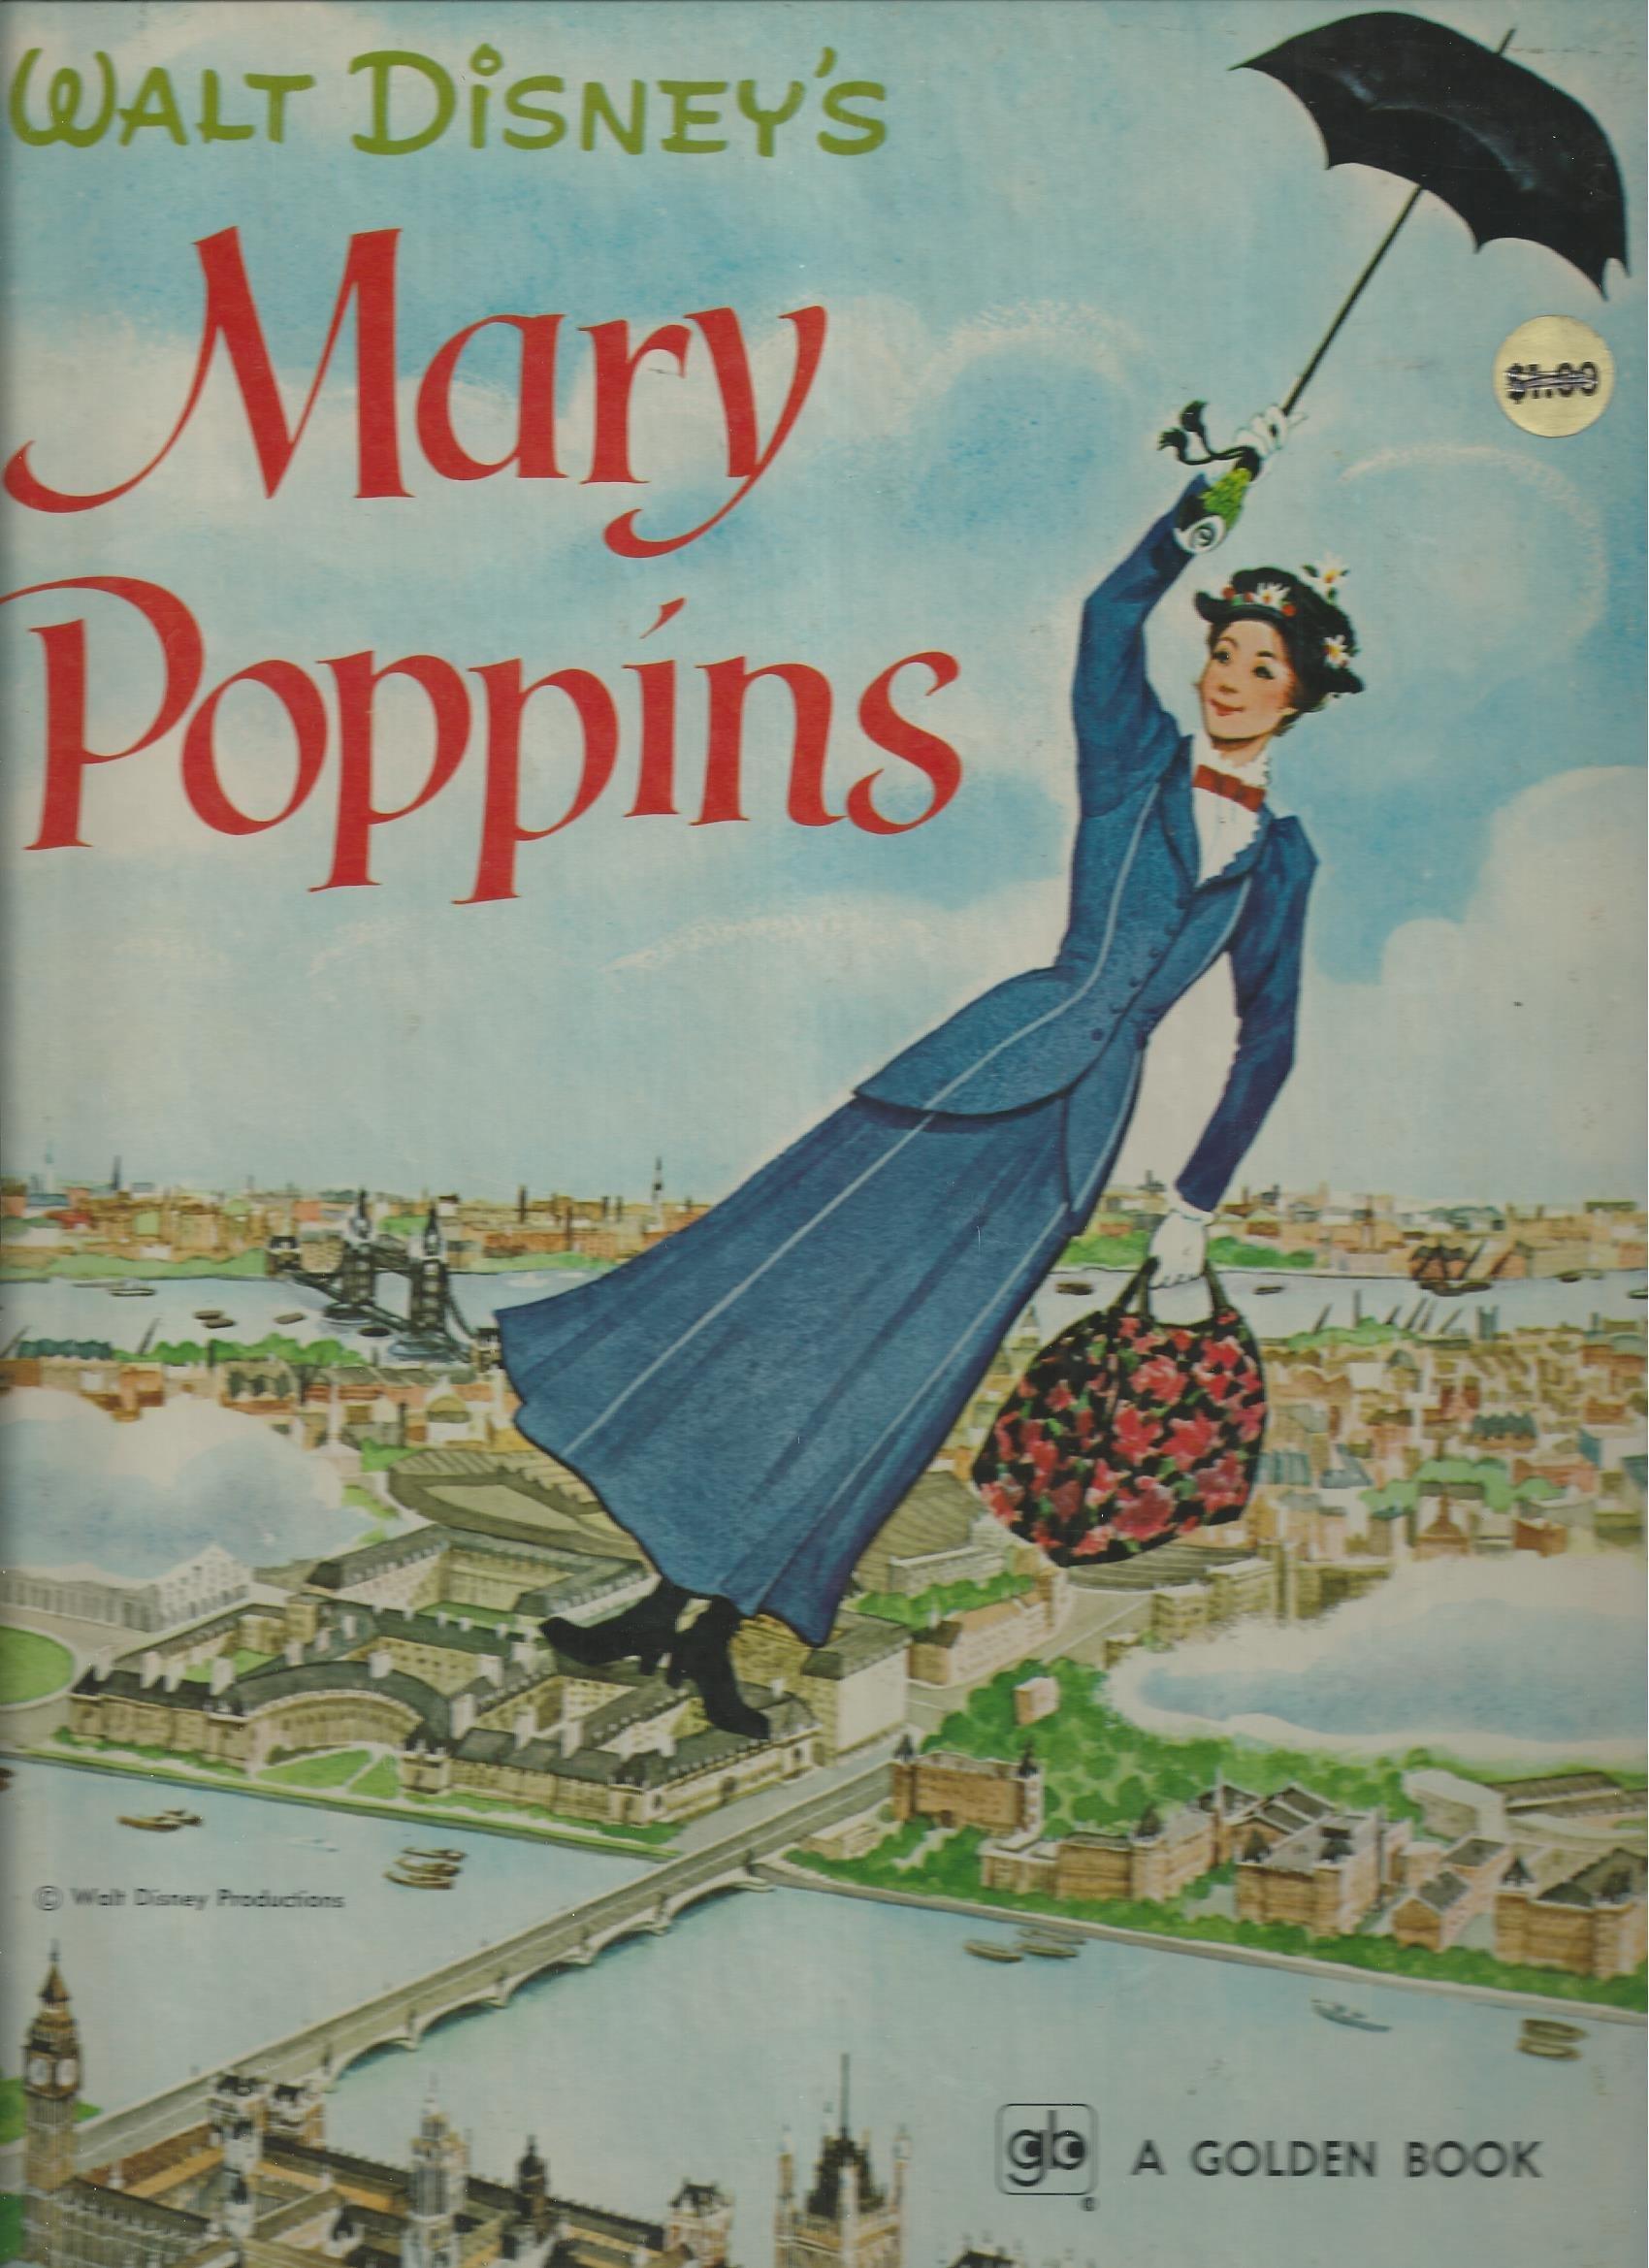 Walt Disney's Mary Poppins